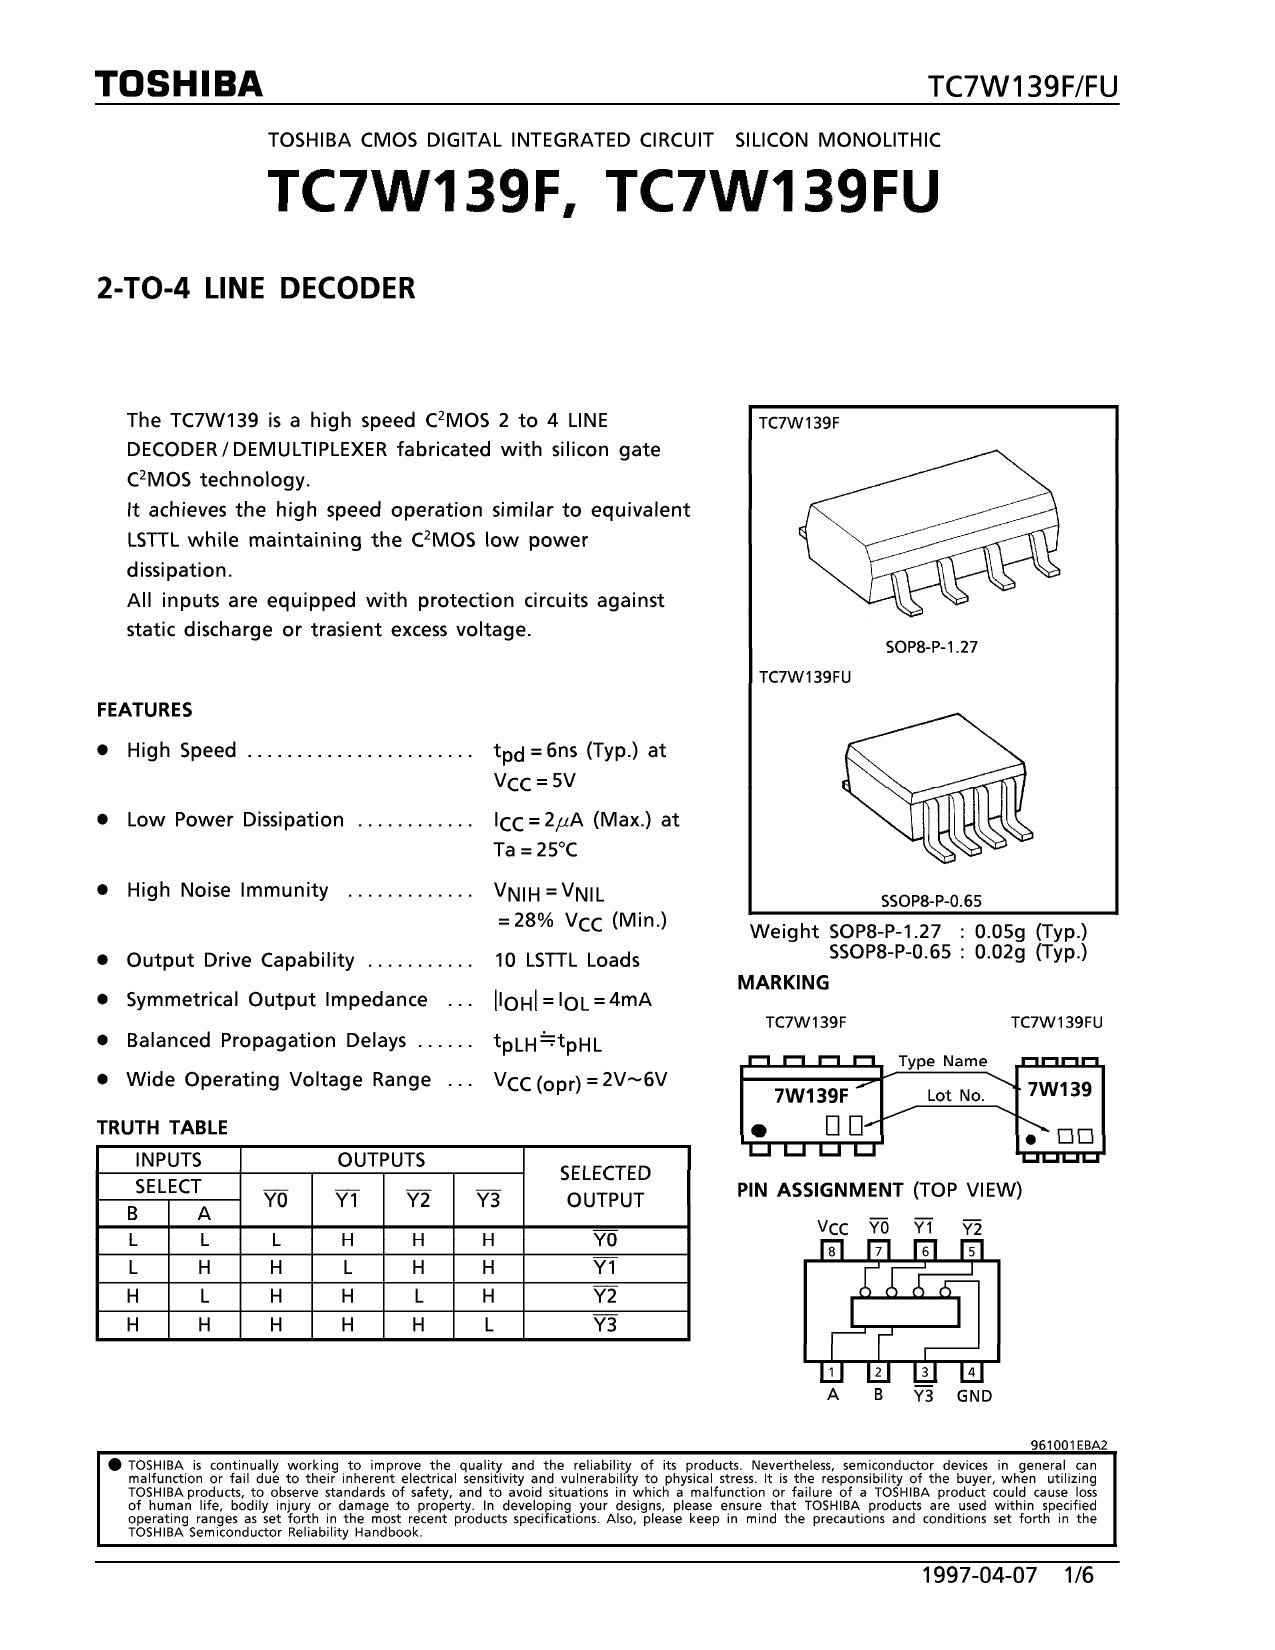 TC7W139FU دیتاشیت PDF